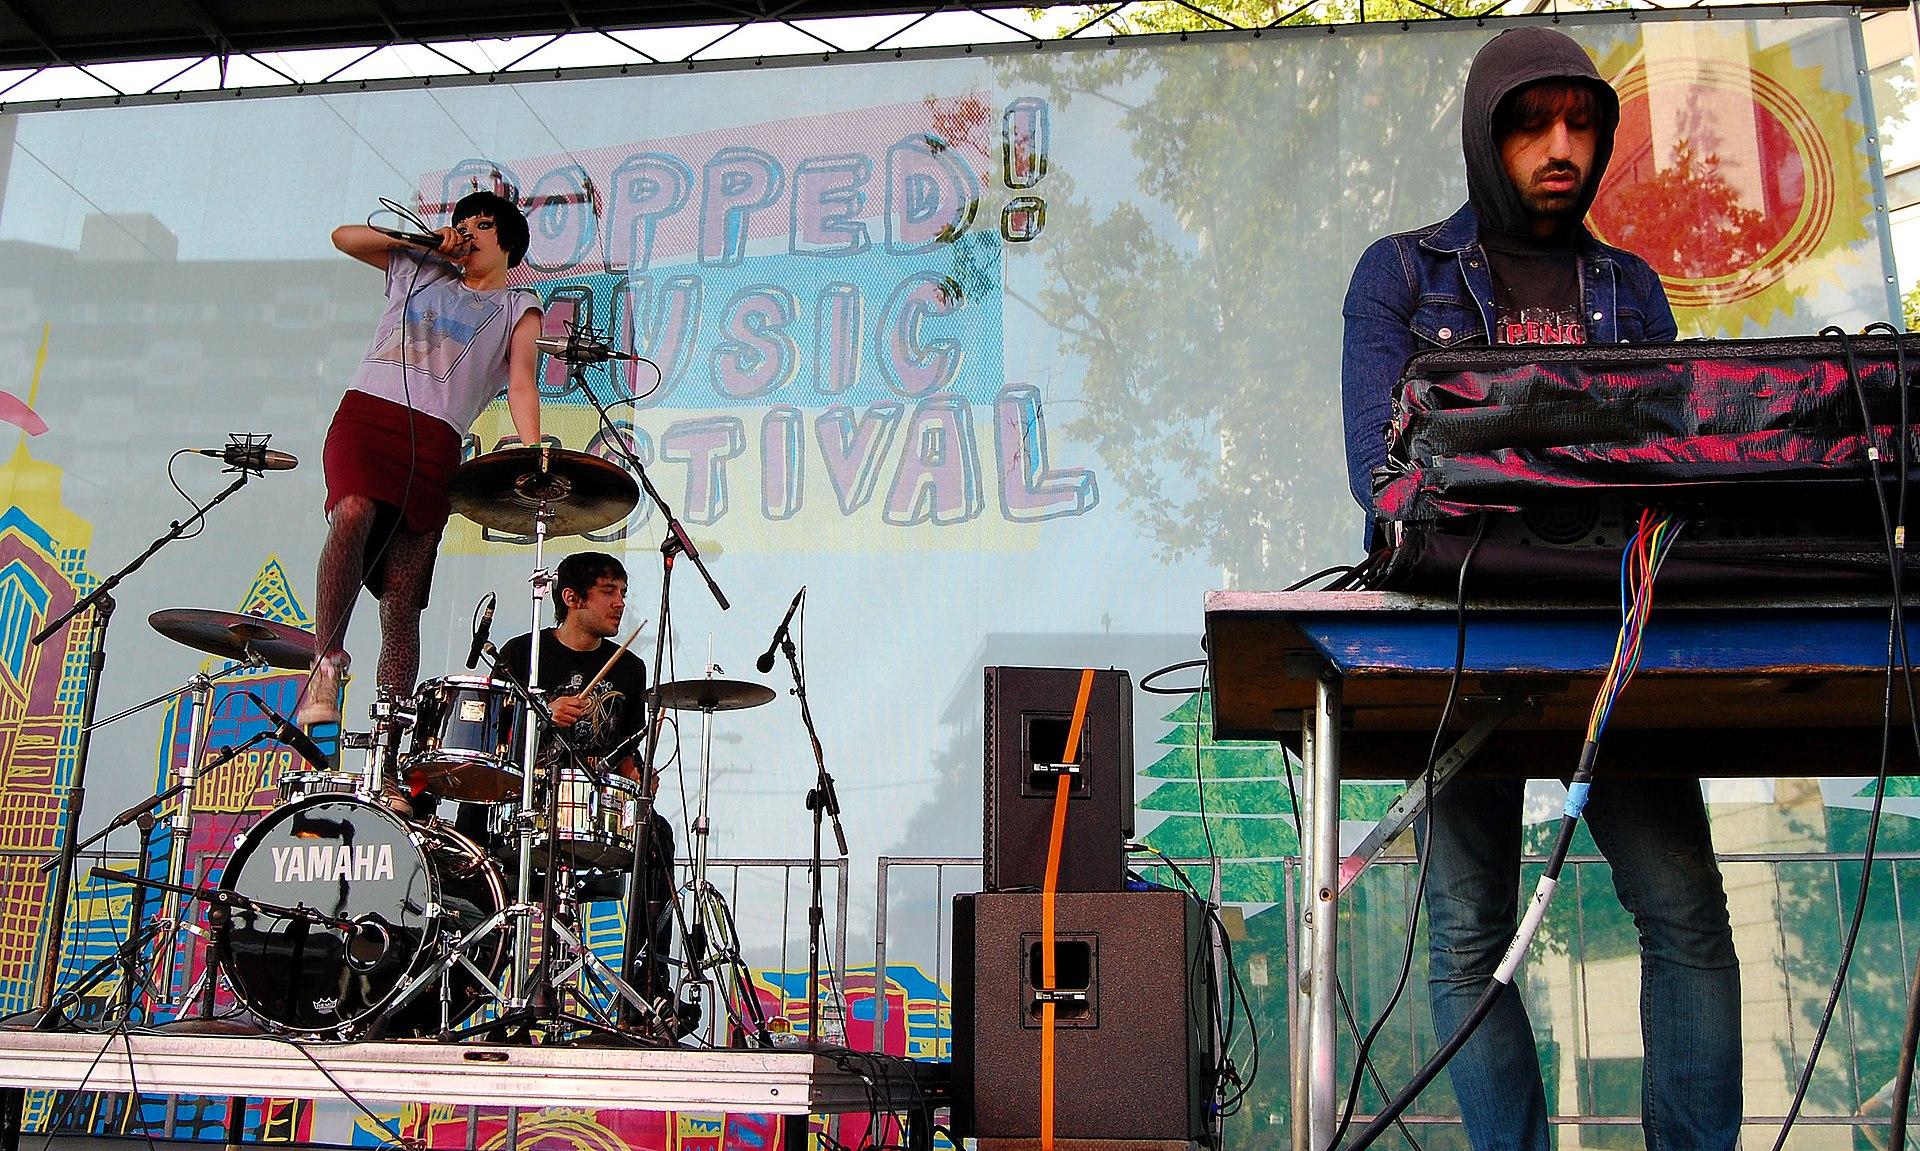 Crystal Castles beim Popped! Music Festival, 2008